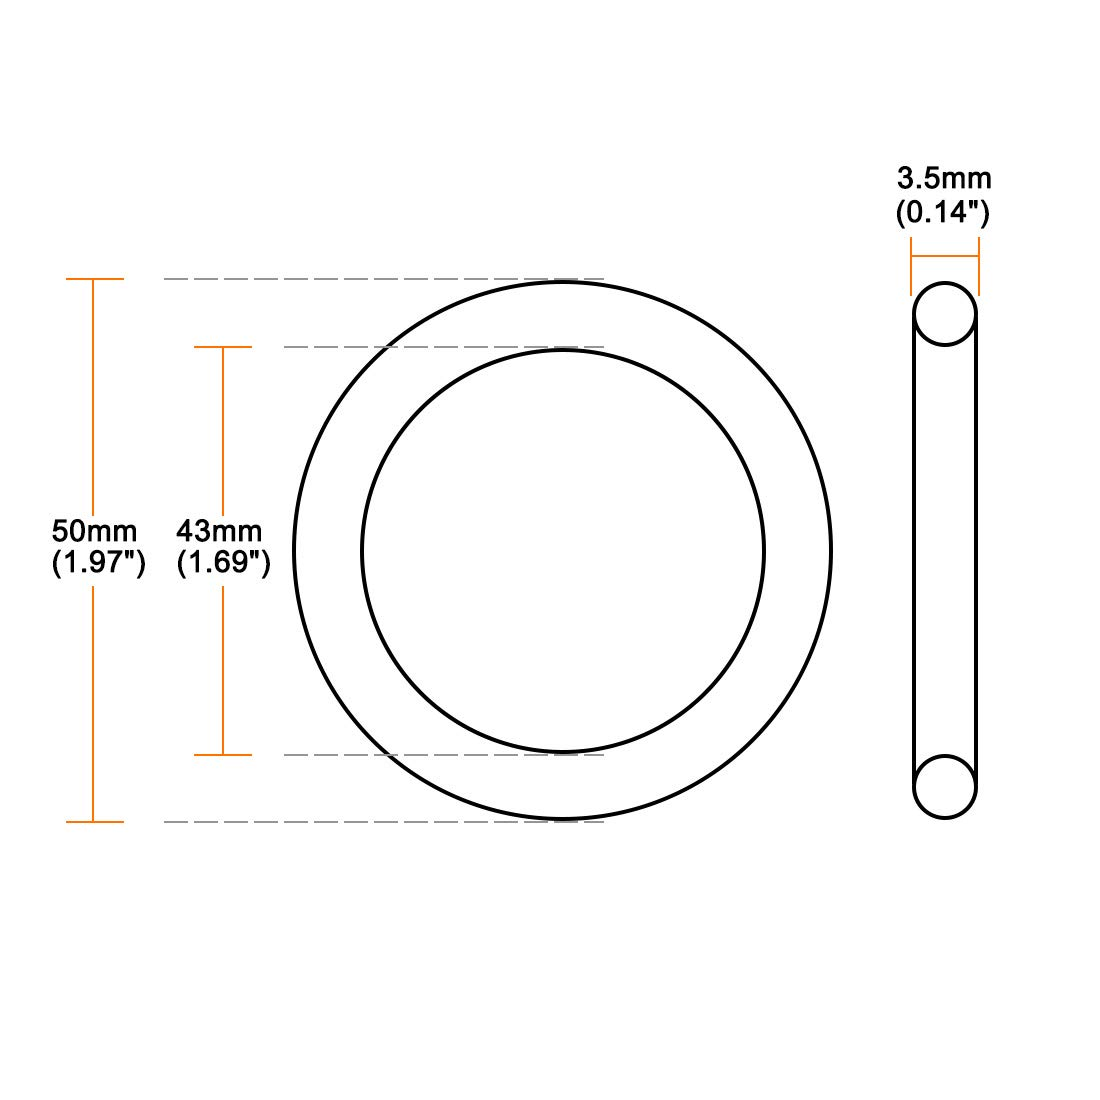 60mm OD sourcing map 5 St/ücke O-Ringe Nitrilkautschuk rundes Siegel Dichtung DE de